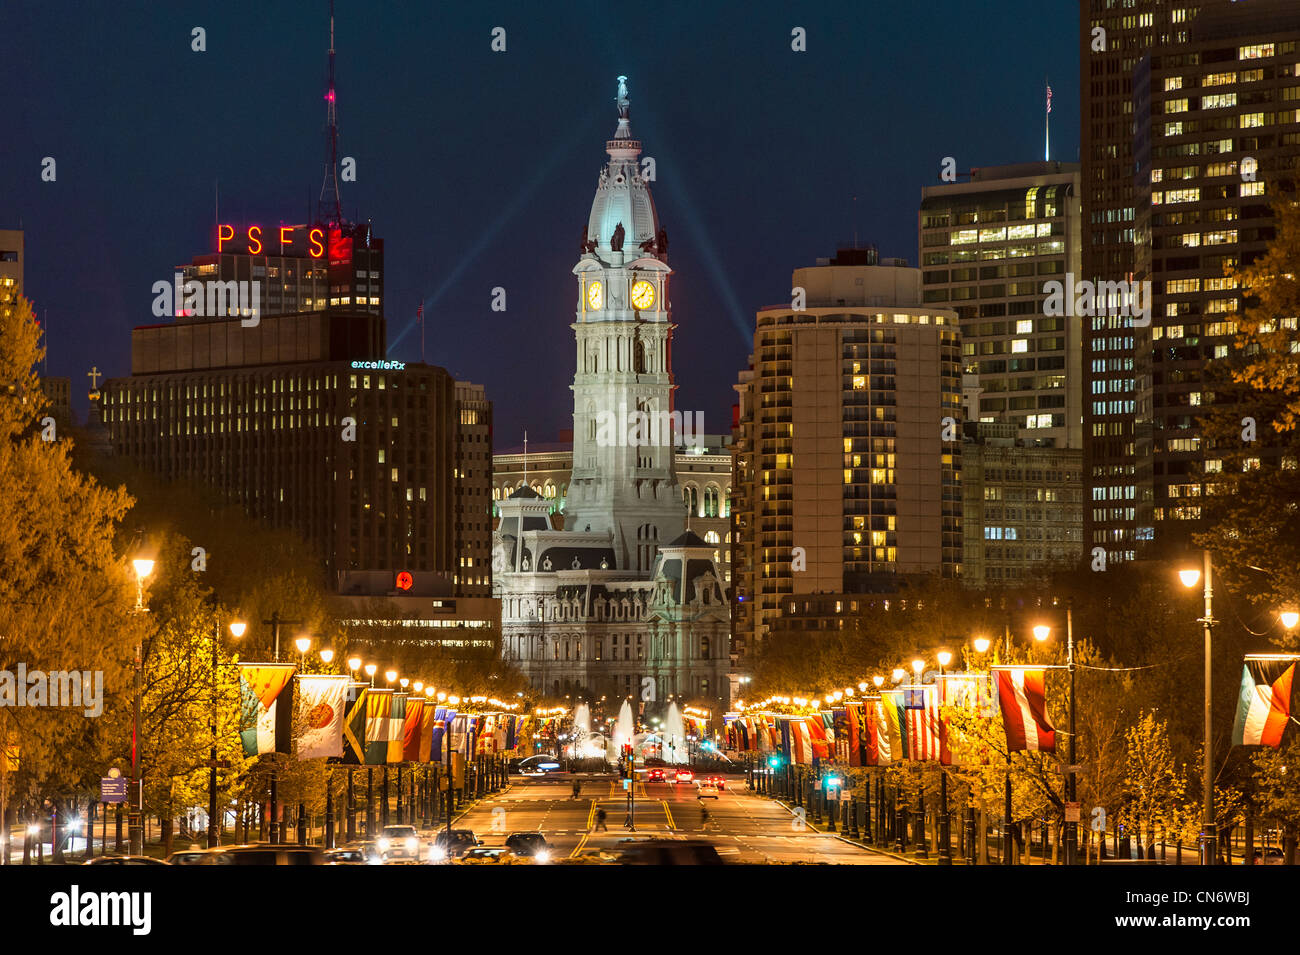 Ben Franklin Parkway y City Hall, Philadelphia, Pennsylvania, EE.UU. Imagen De Stock